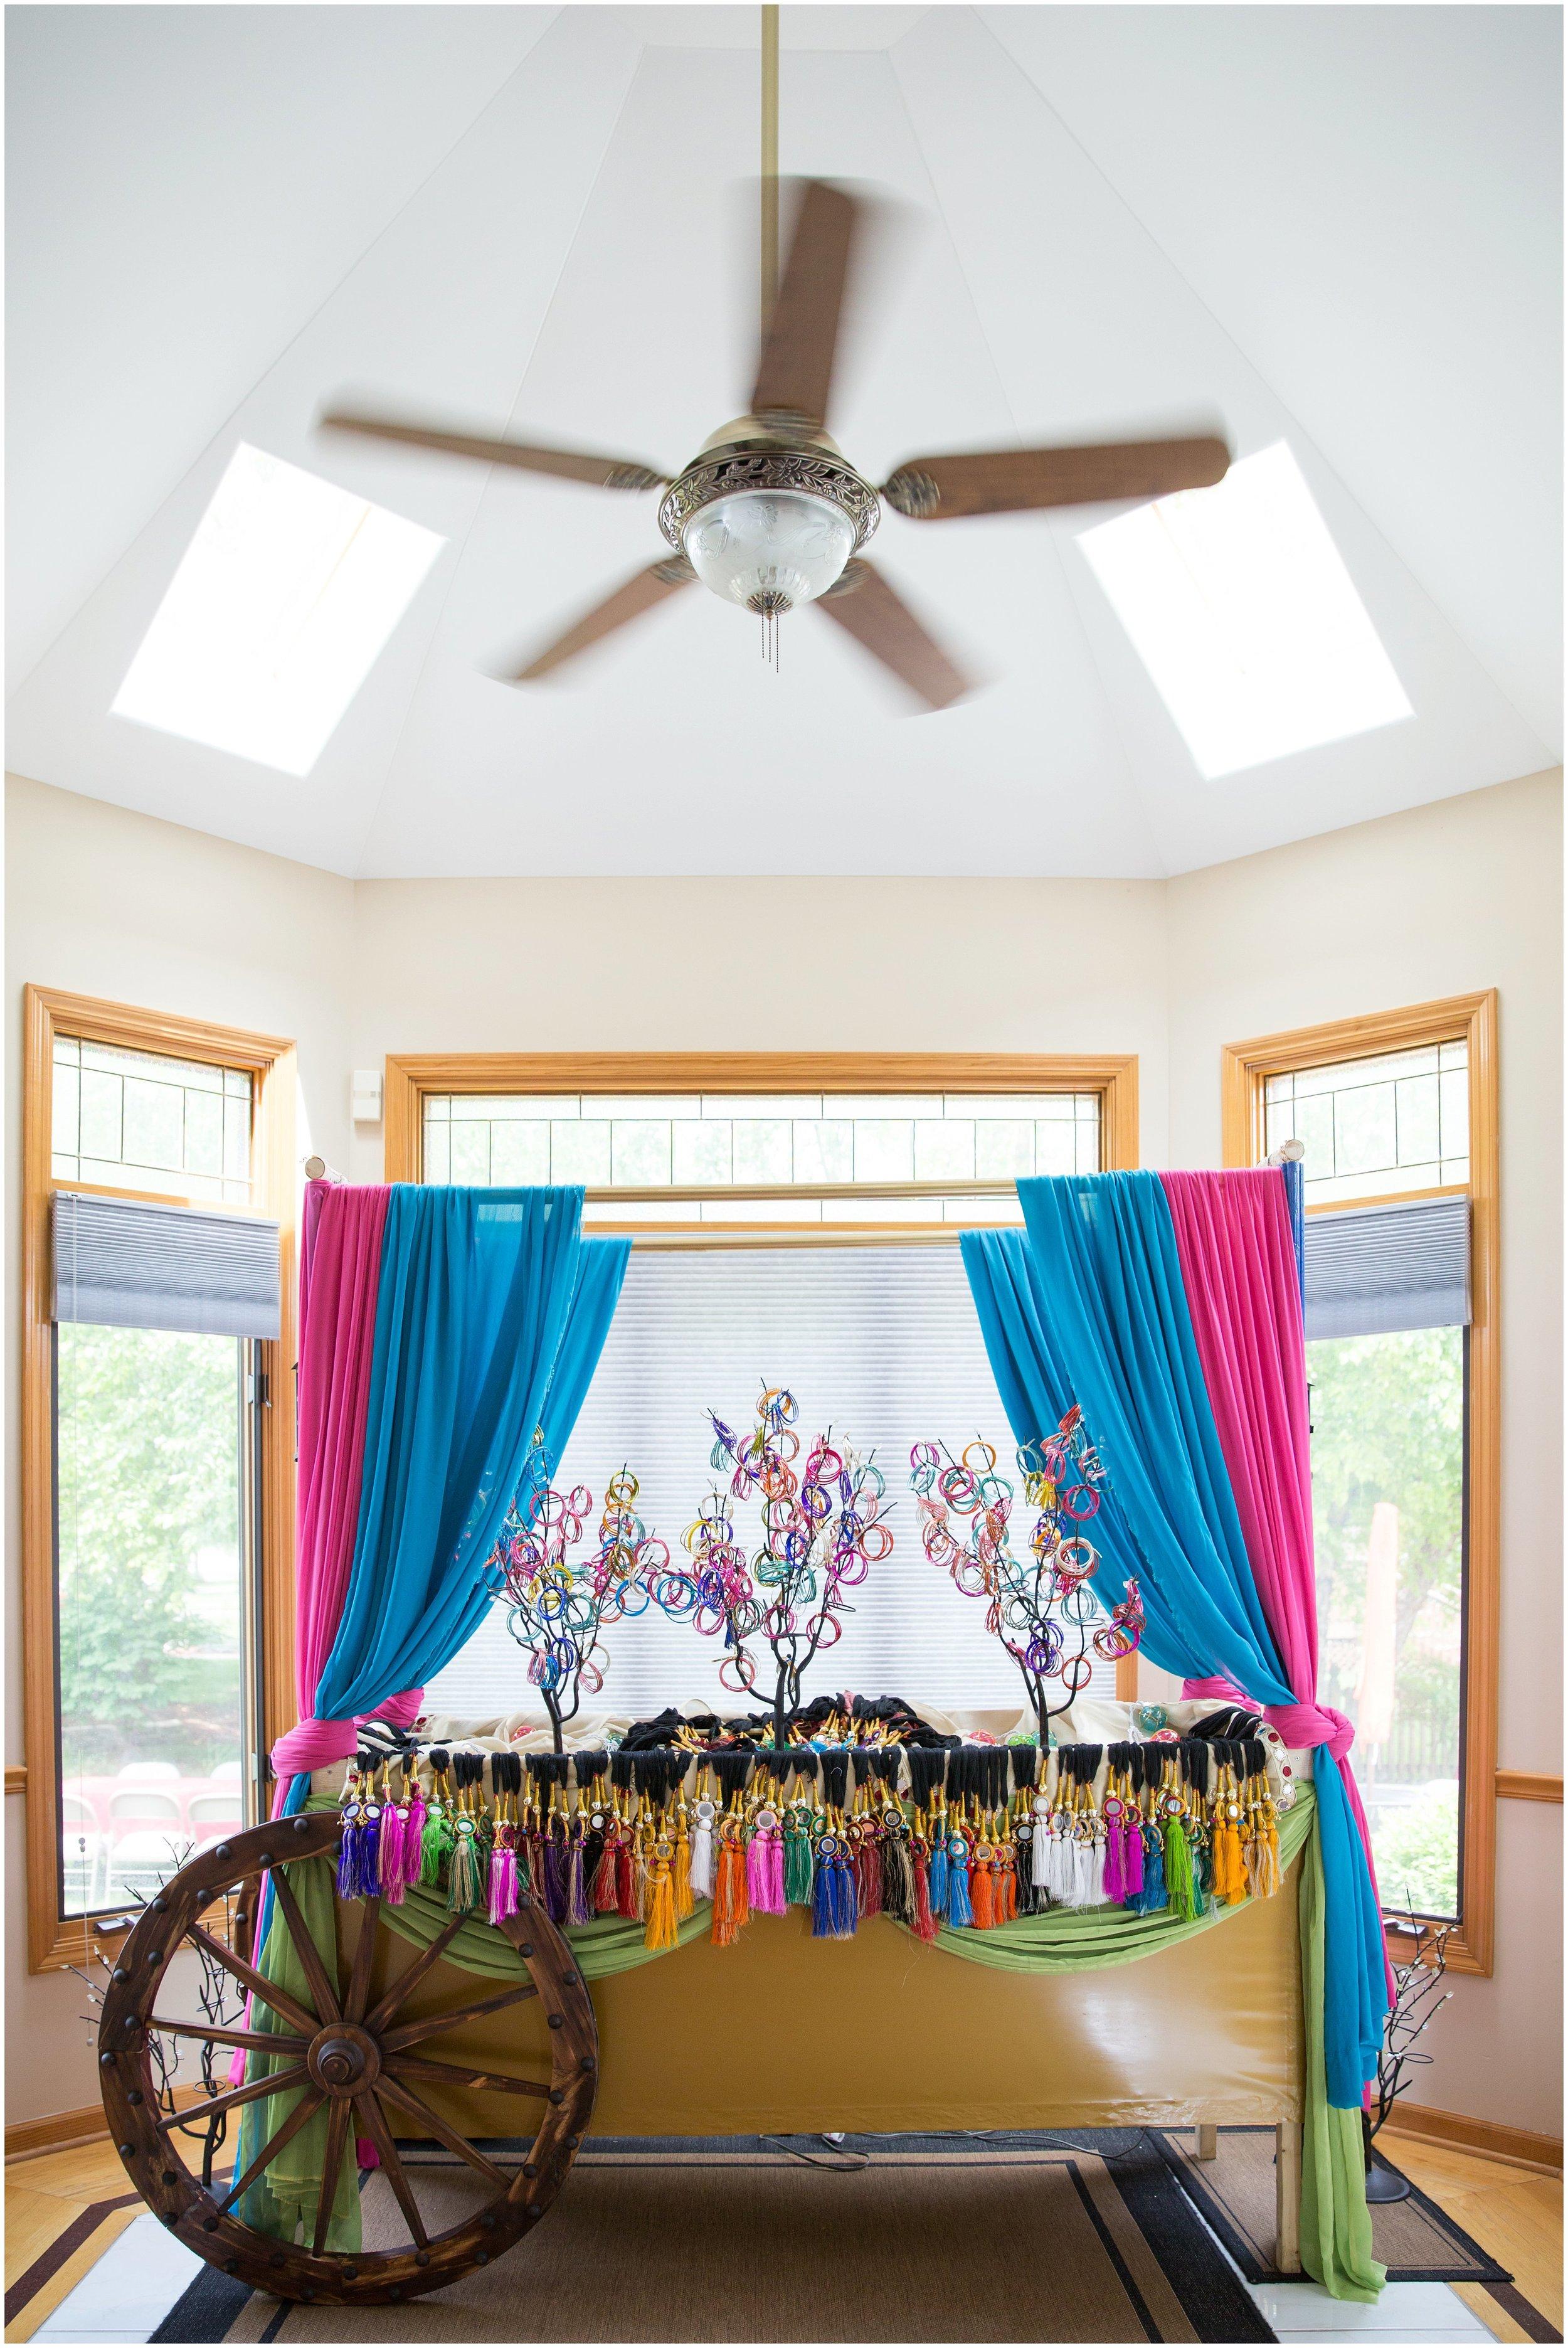 Le Cape Weddings - South Asian Wedding in Illinois - Tanvi and Anshul -2493_LuxuryDestinationPhotographer.jpg